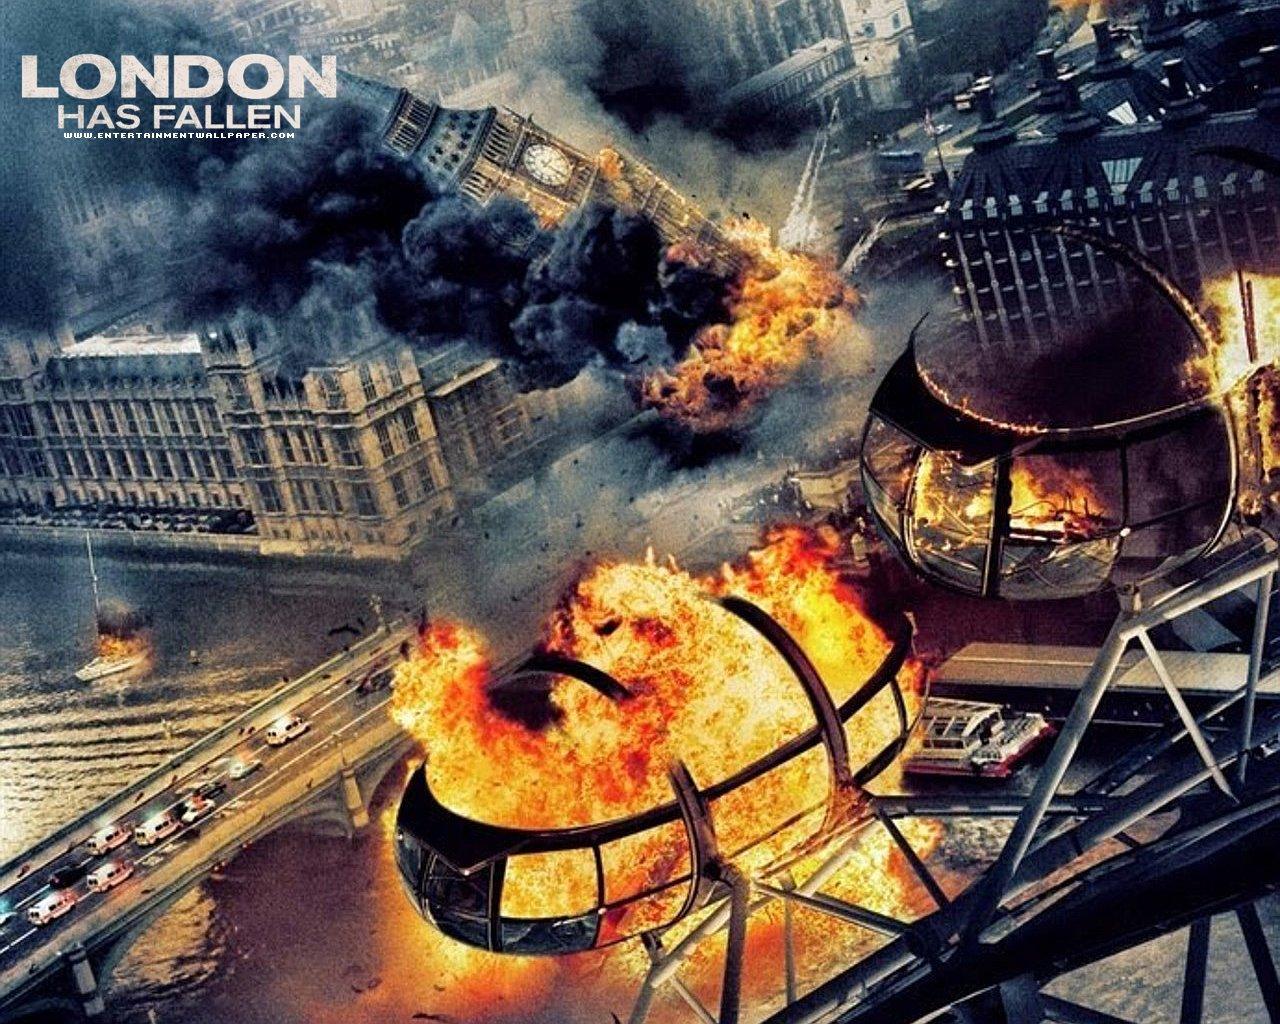 london has fallen wallpaper 10046113 size 1280x1024 more london has 1280x1024